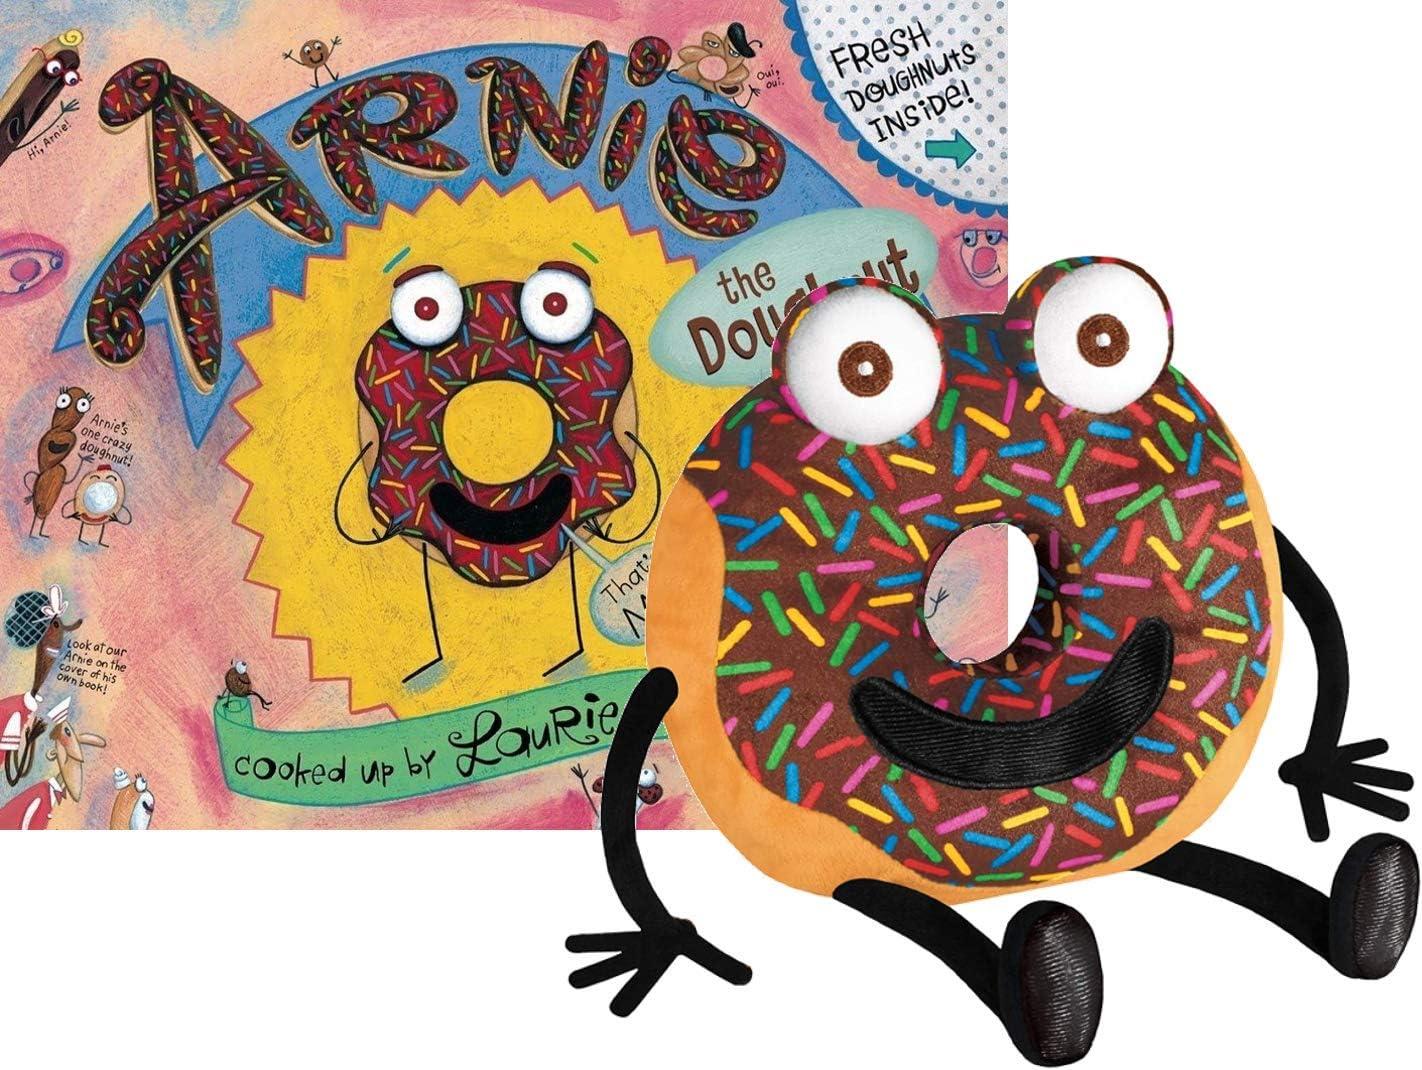 正規取扱店 YOTTOY デポー Plush Book Gift Arnie Set Doughnut The